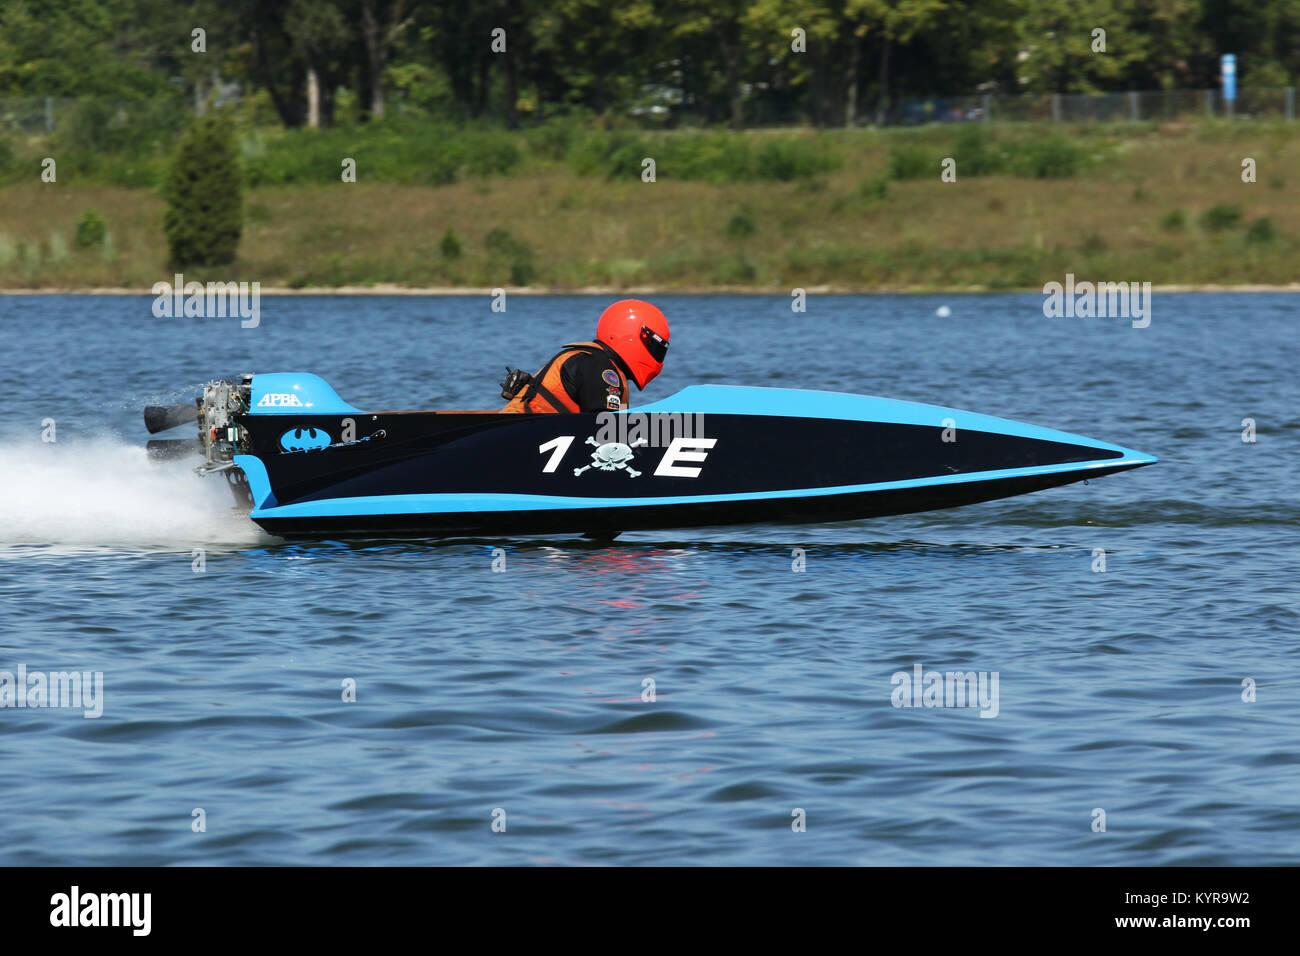 Boat 1E. Outboard Hydroplane boat races. Dayton Record Runs Regatta. Eastwood Lake, Dayton, Ohio, USA. - Stock Image